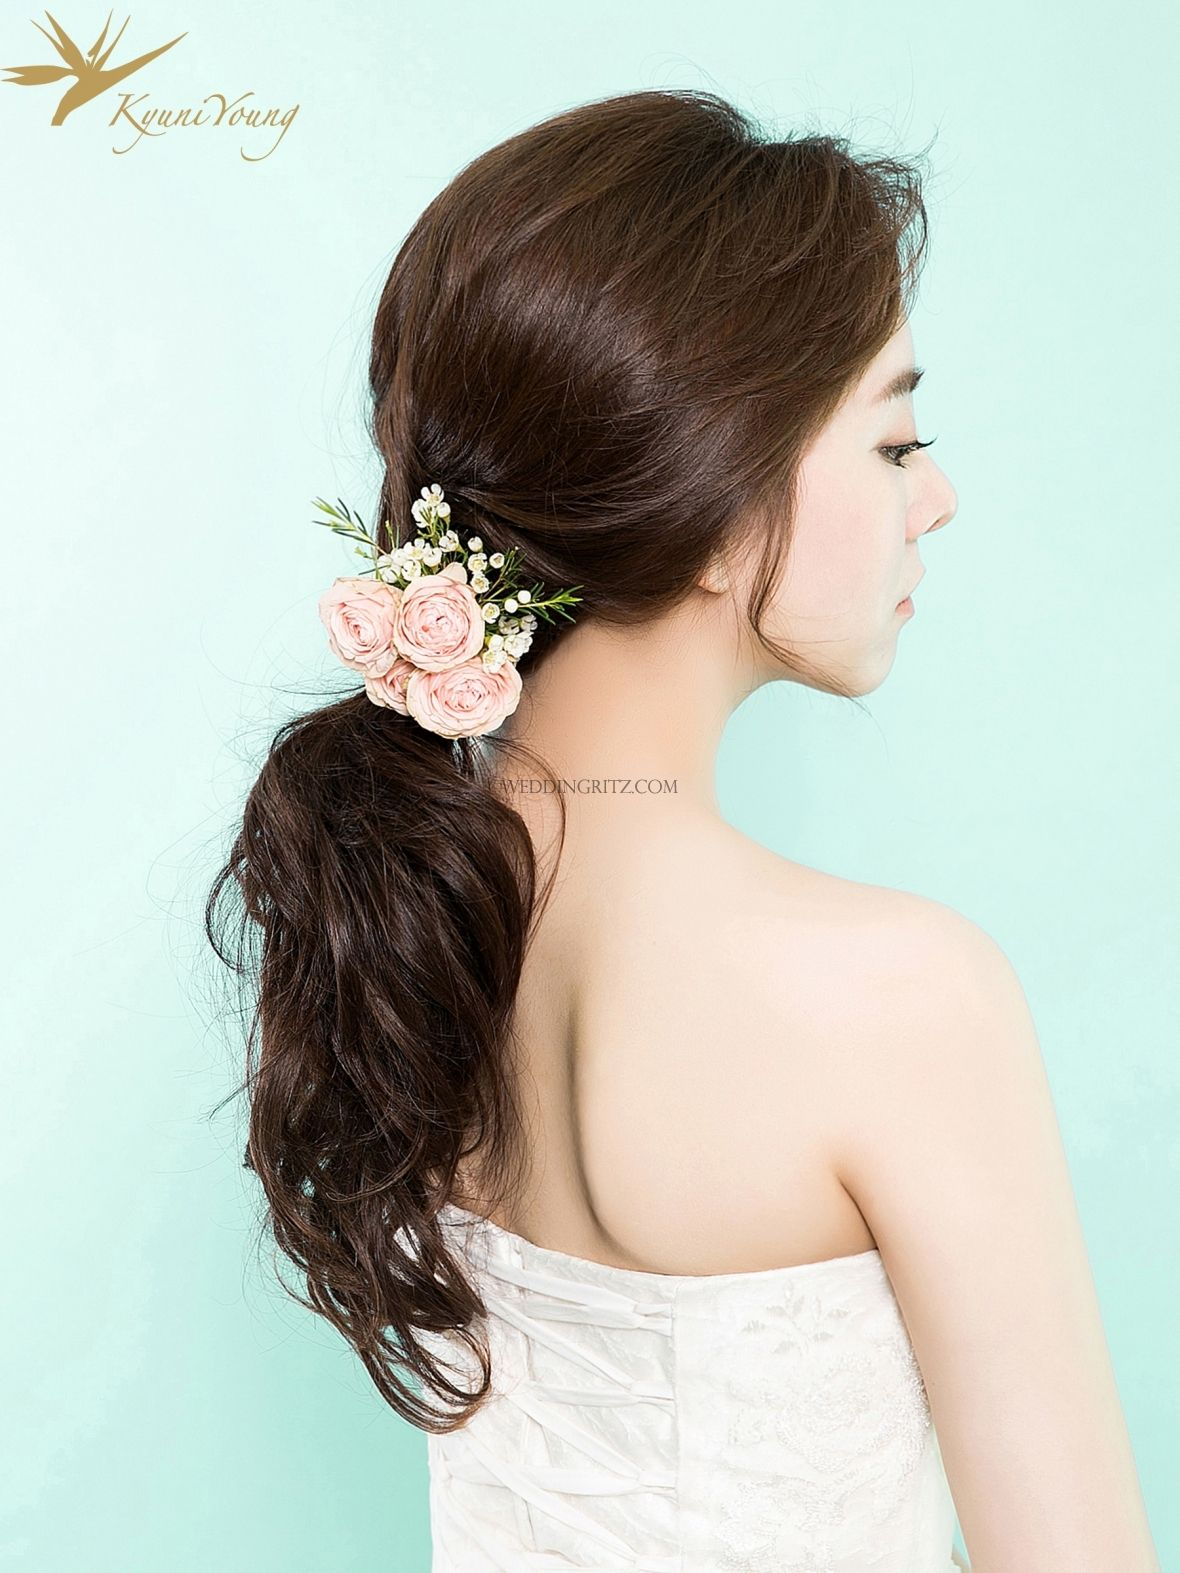 beautiful gyuniyoung in korea hair & makeup sample | wedding